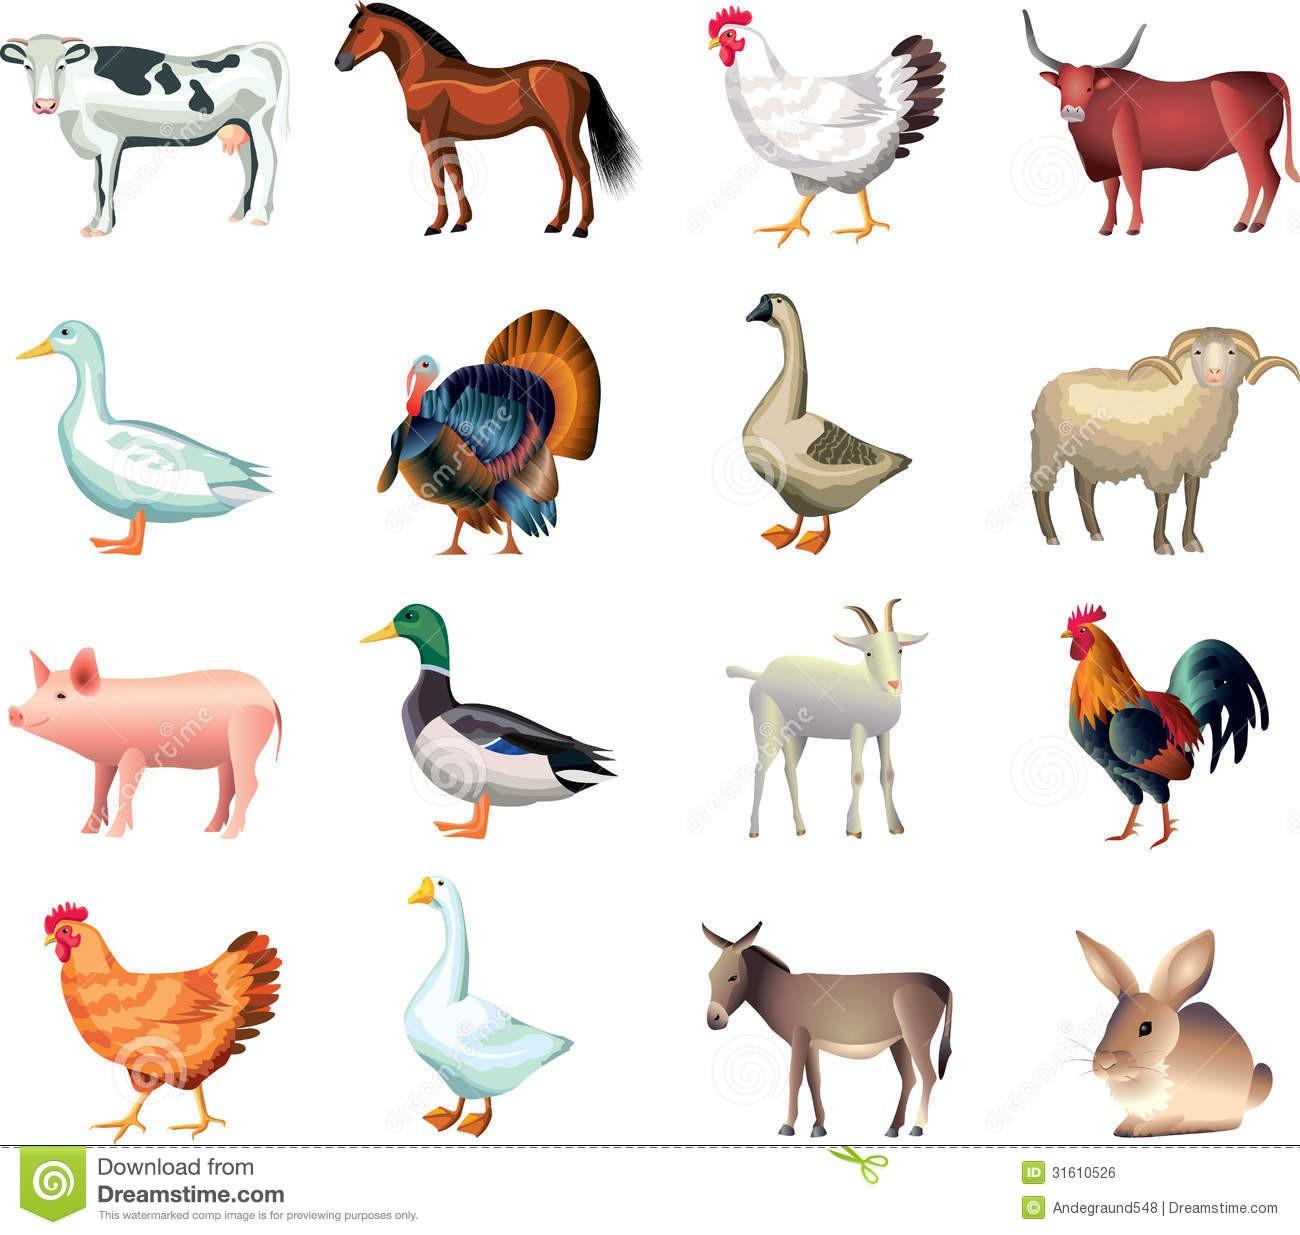 Realistic animal clipart clip art free In Farm Animals Clipart Realistic Animal 1   Clip Art clip art free